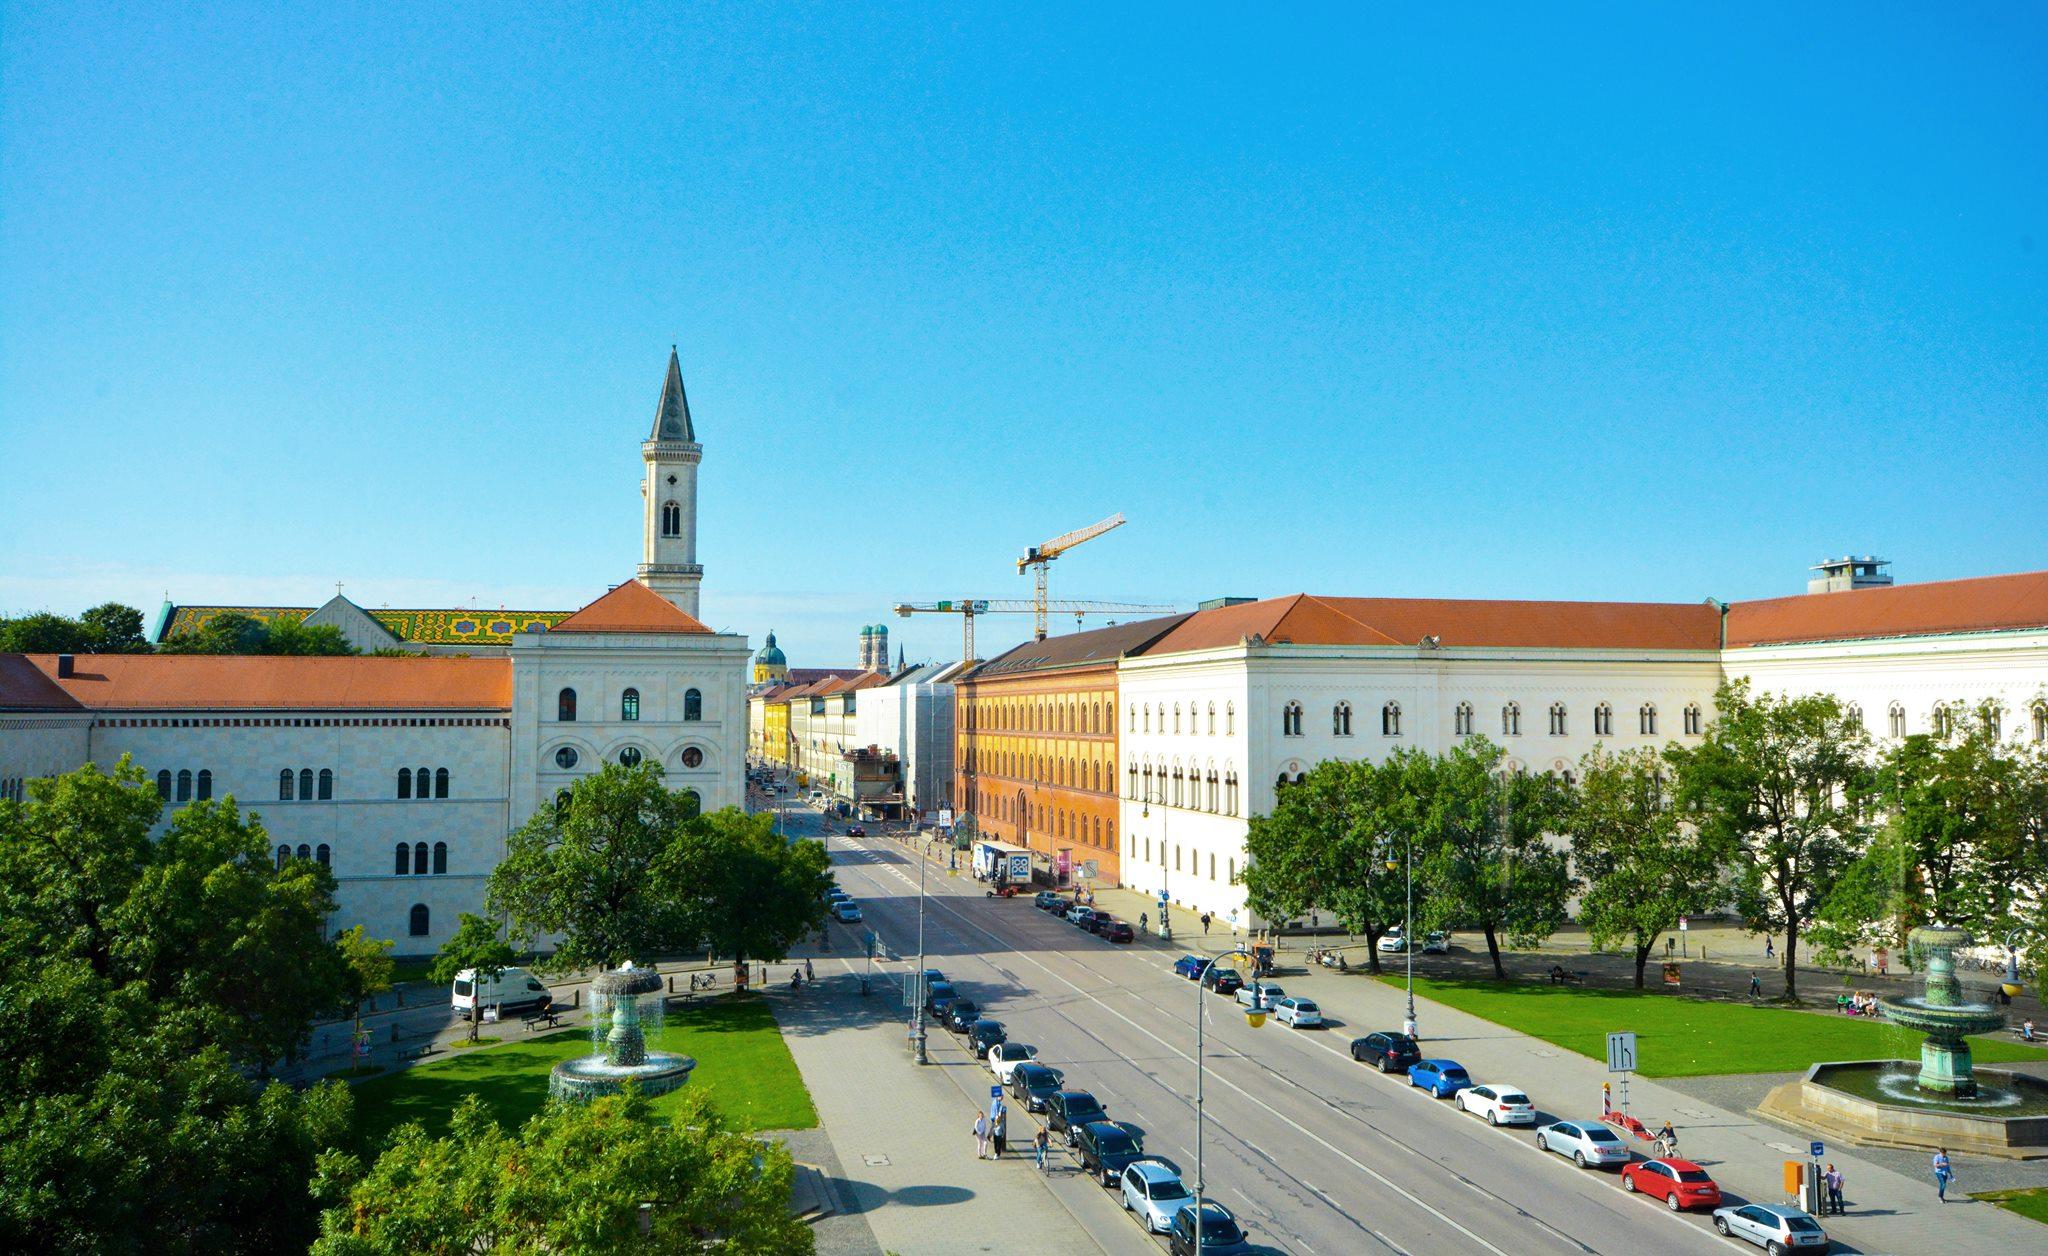 Ludwig Maximilian University of Munich – LMU Campus